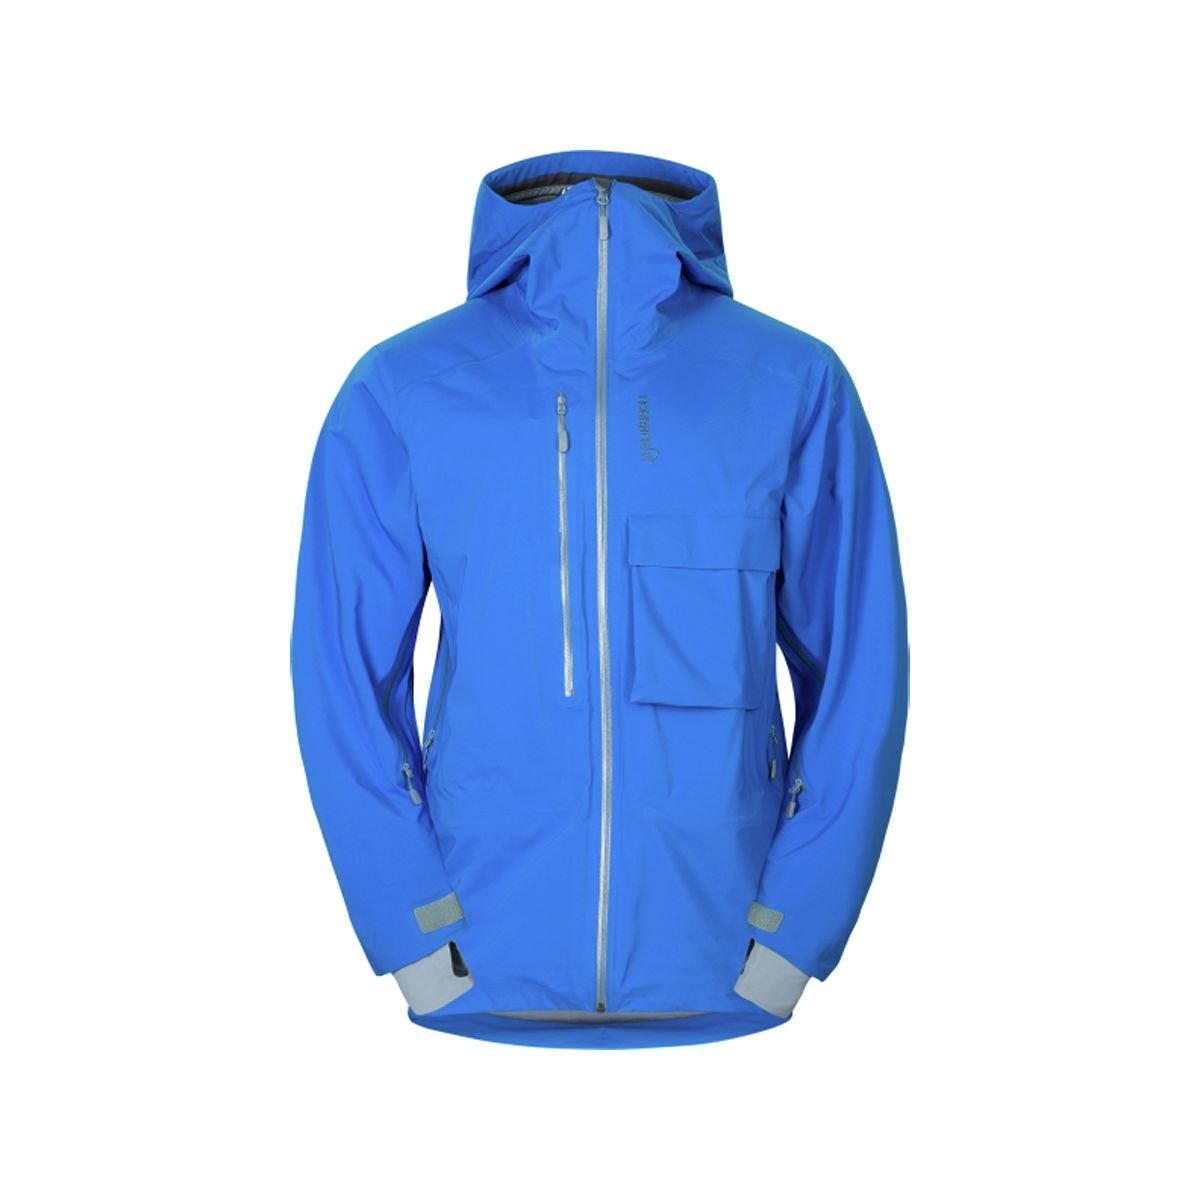 NORRONA(ノローナ) Lyngen Driflex3 Jacket Men's 3200-15 B014T2JTQU M Hot sapphire Hot sapphire M